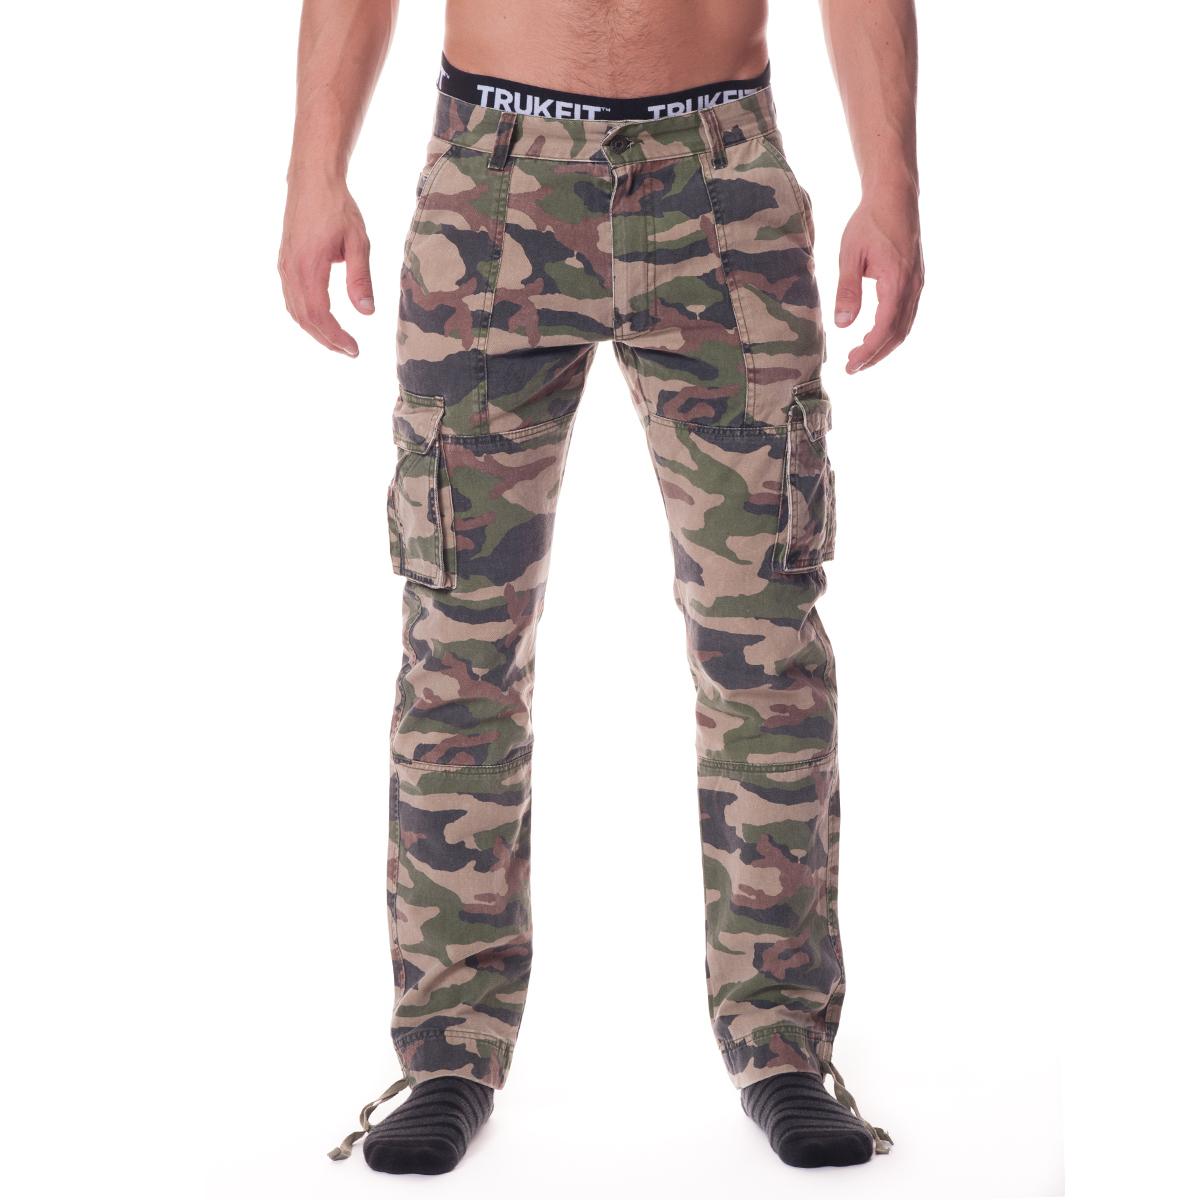 Trukfit Taylored Cargo Pants